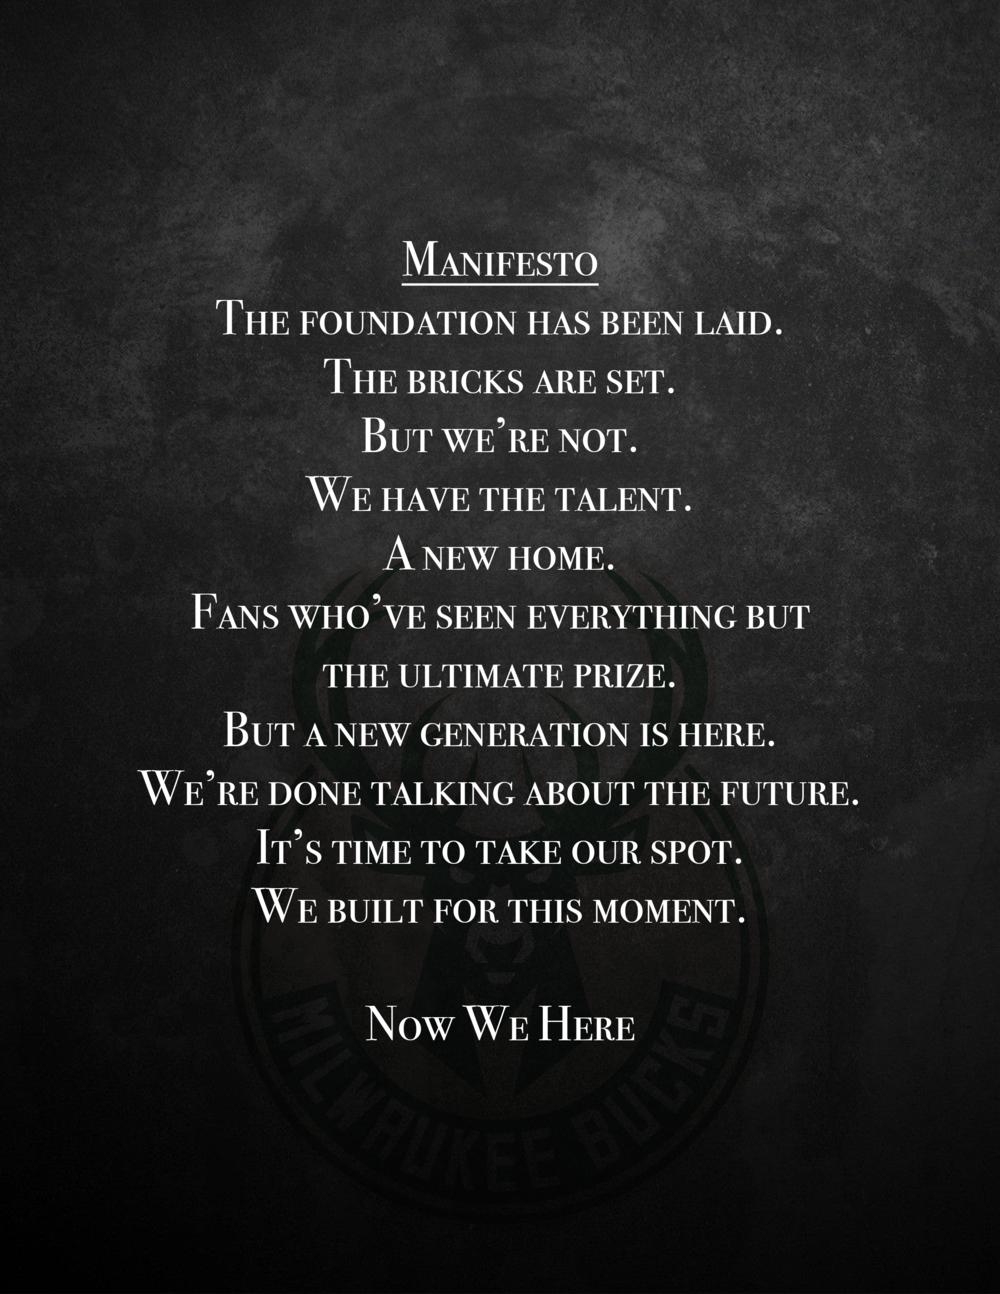 Bucks Manifesto.png